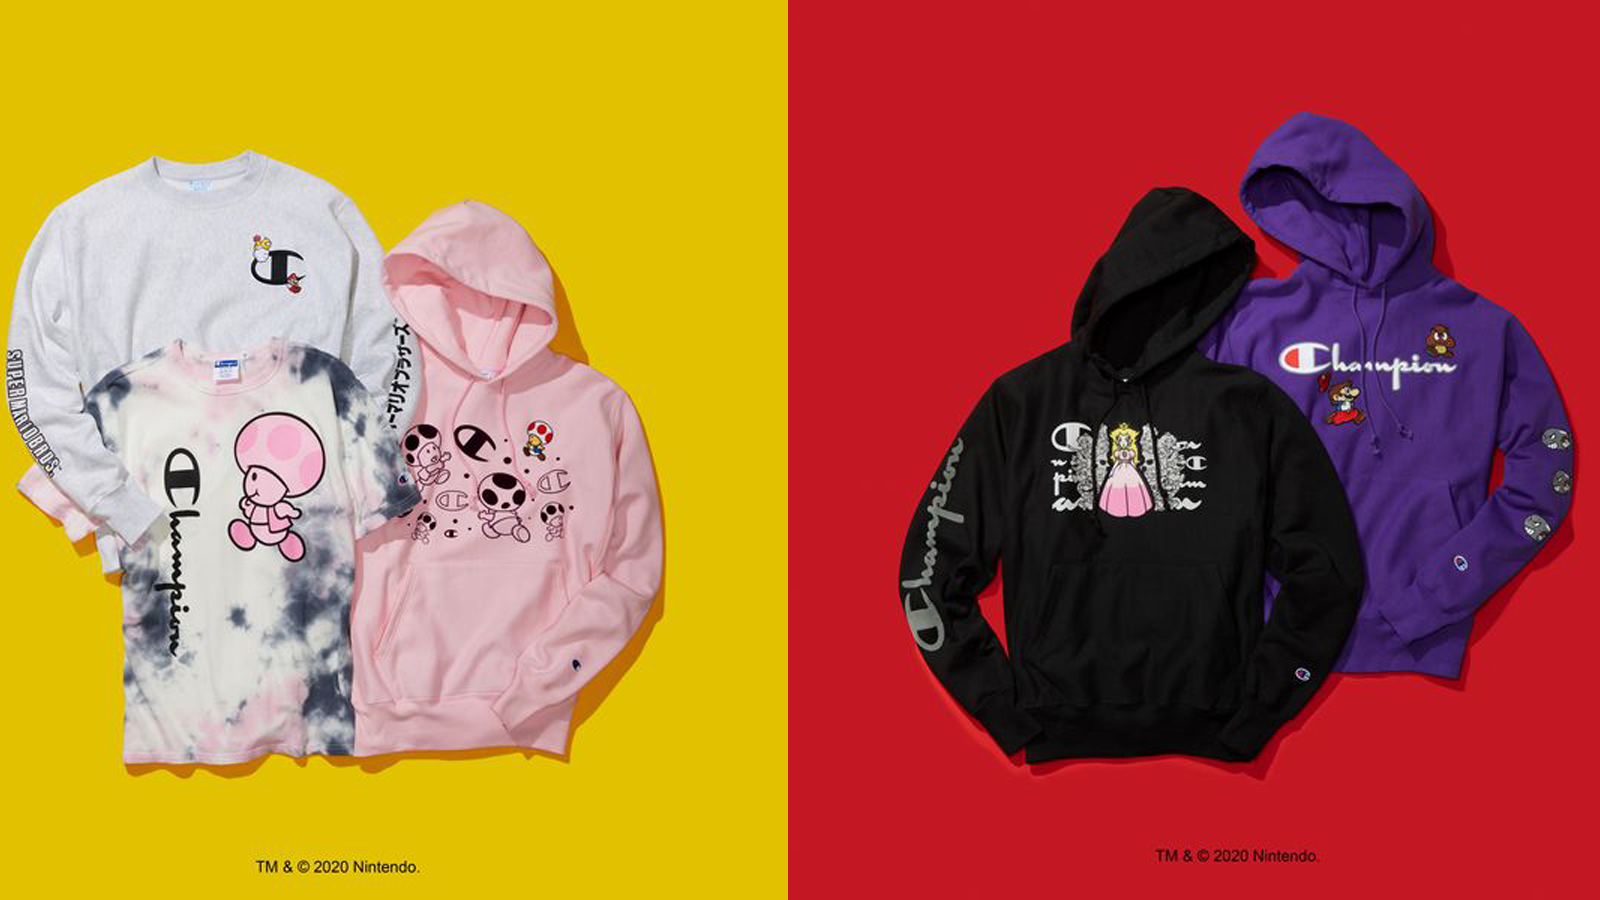 Additional Champion Nintendo collaboration clothing items